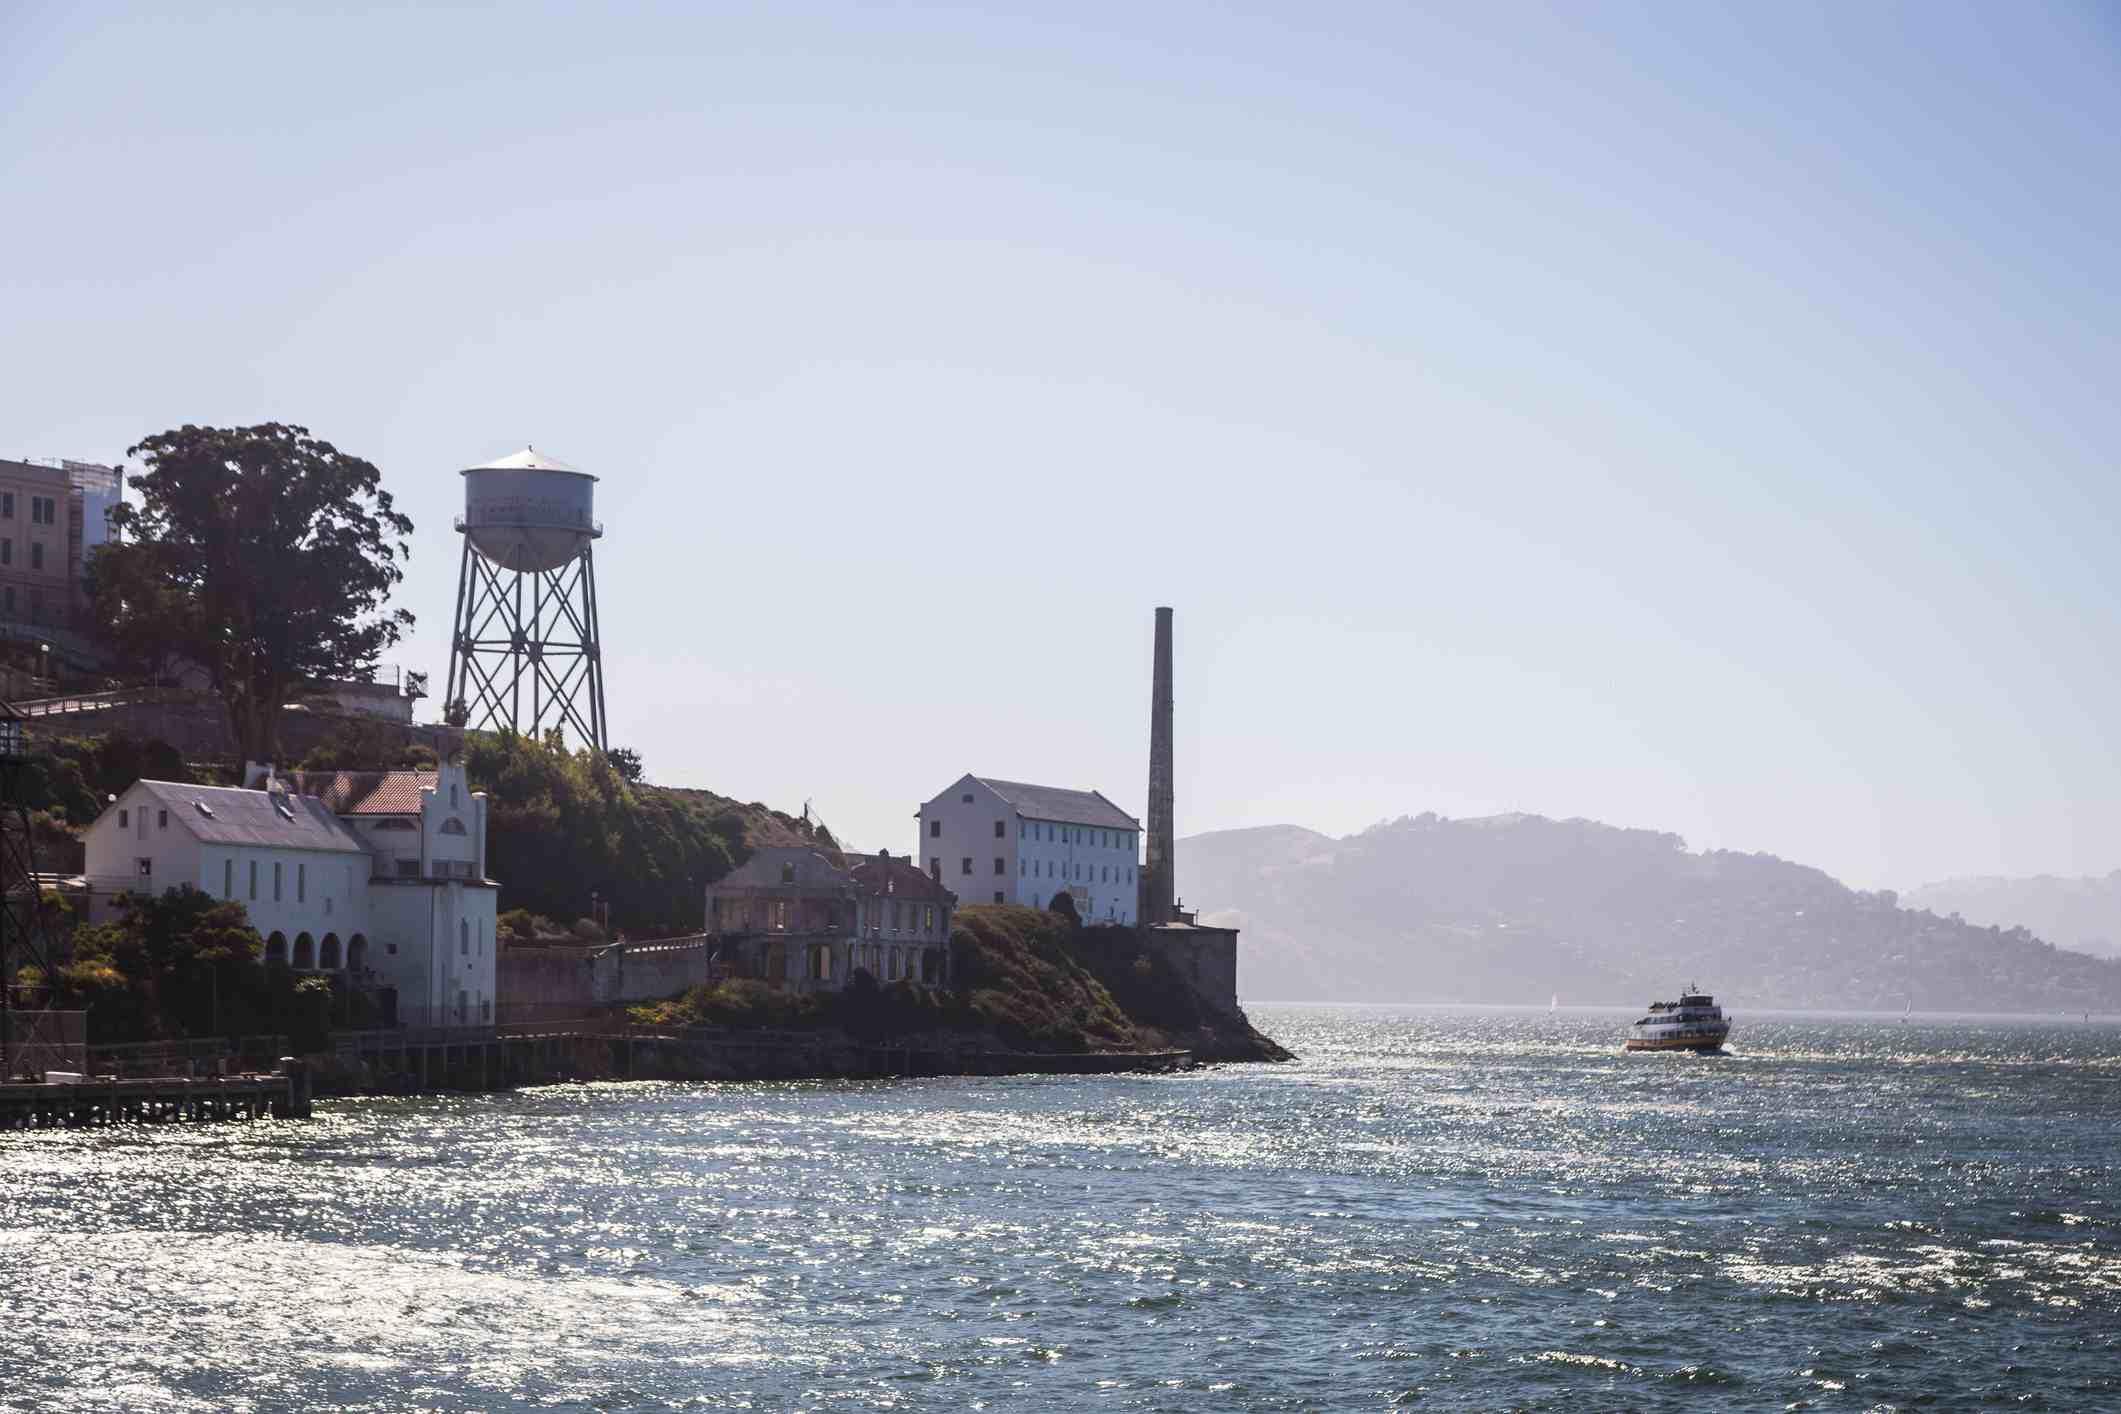 The Alcatraz ferry travels past the island